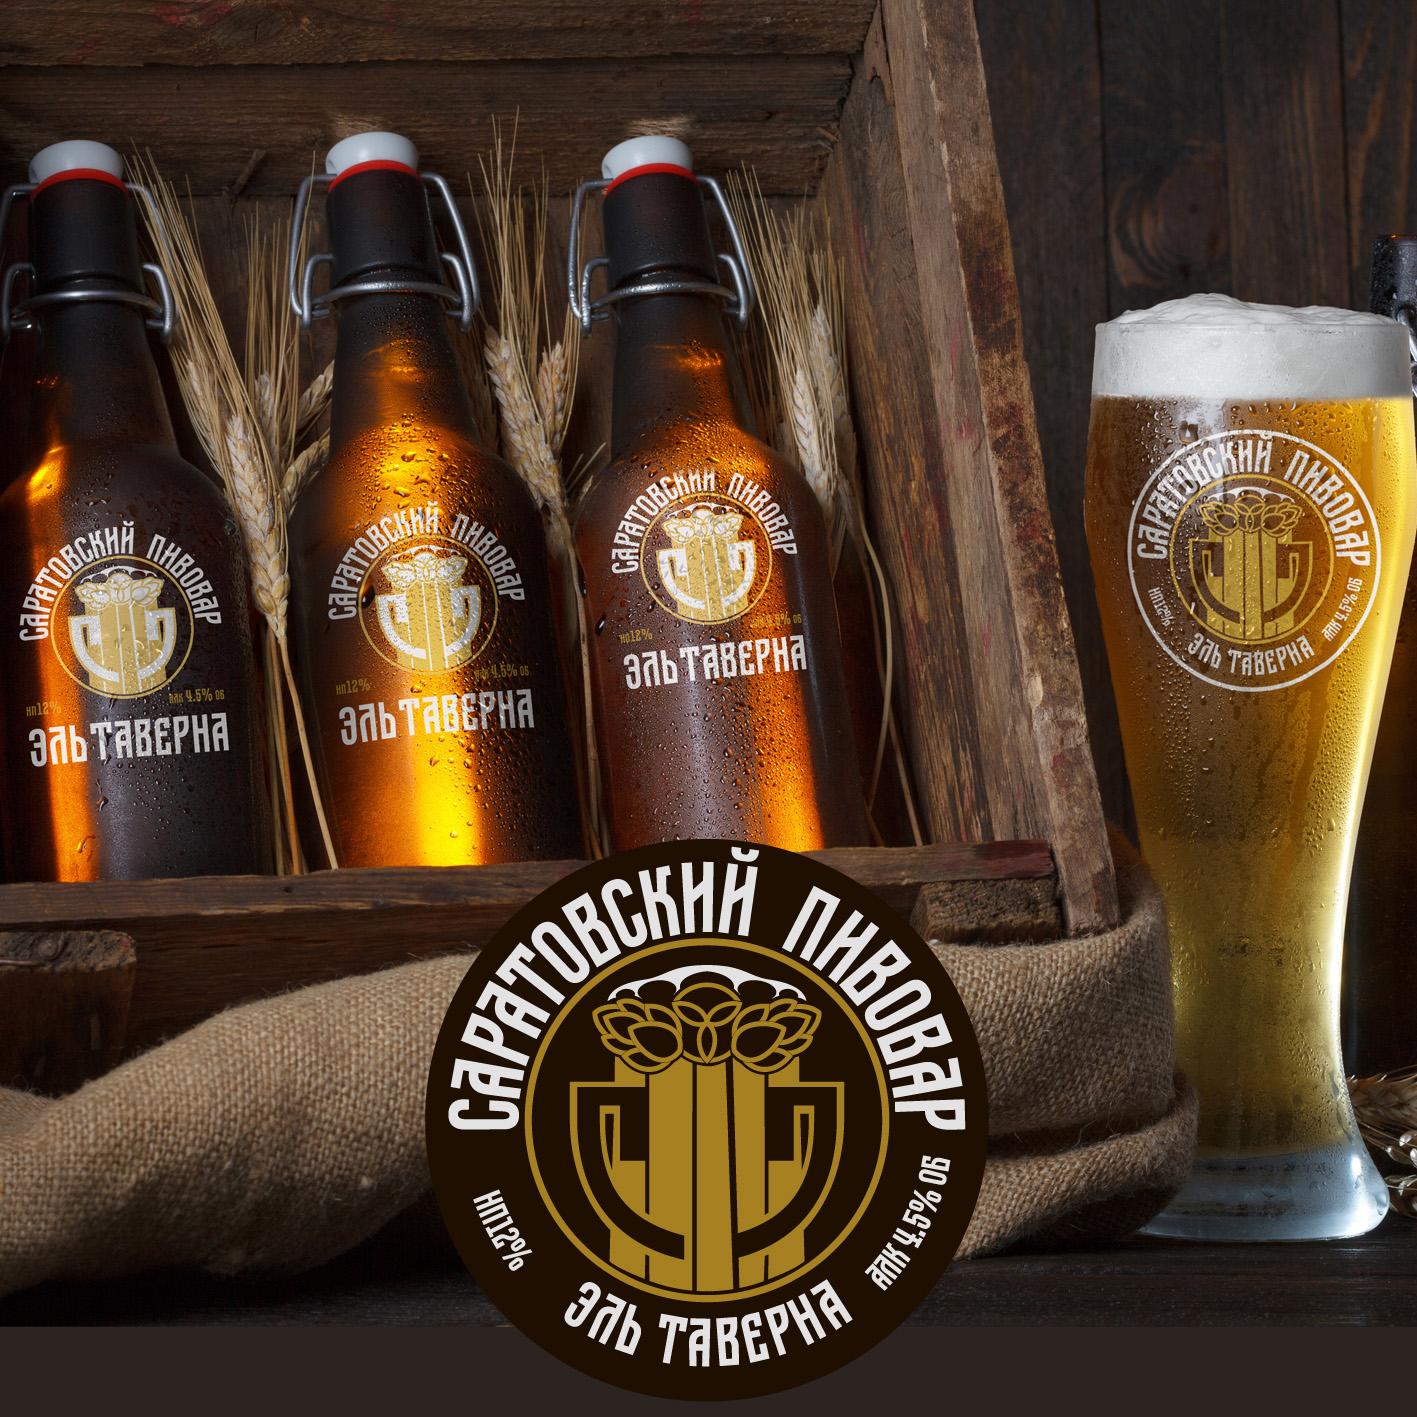 Разработка логотипа для частной пивоварни фото f_9385d7ffcf859f67.jpg